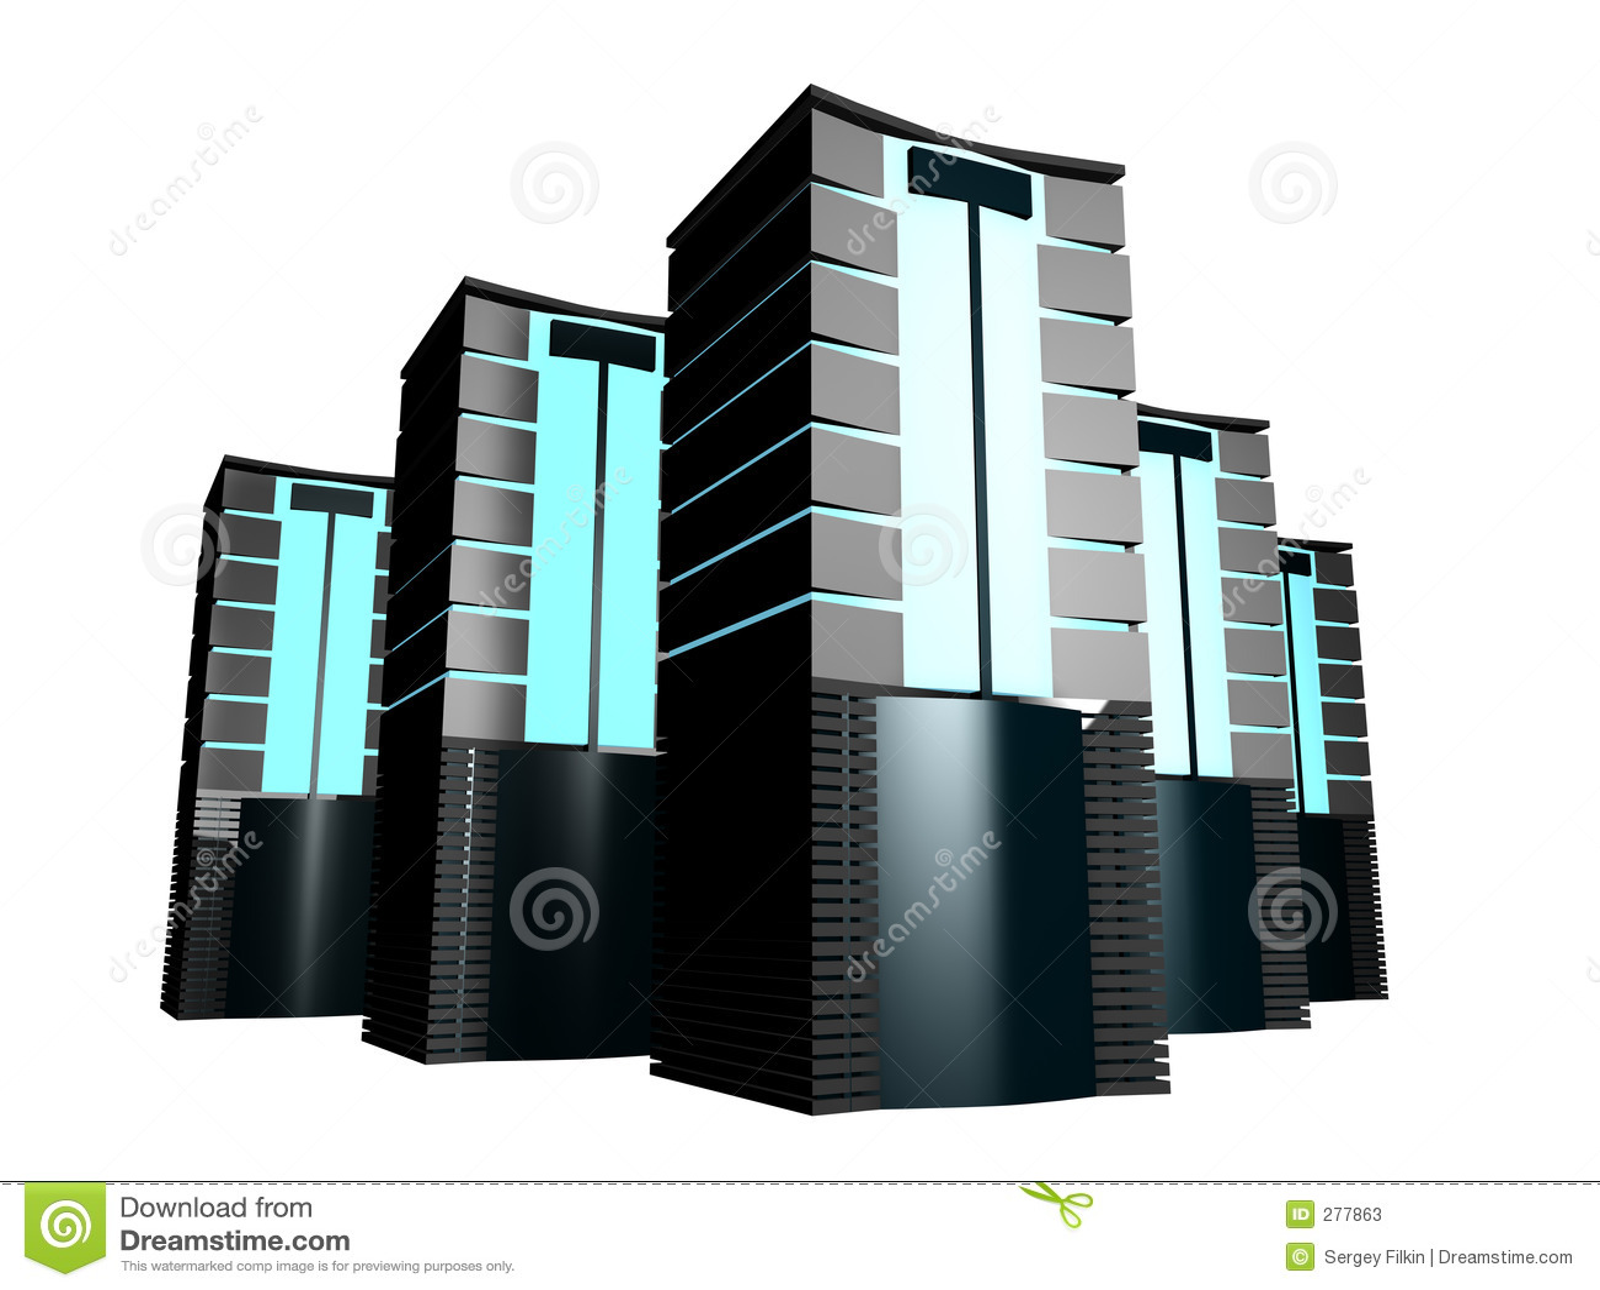 Group Servers 3